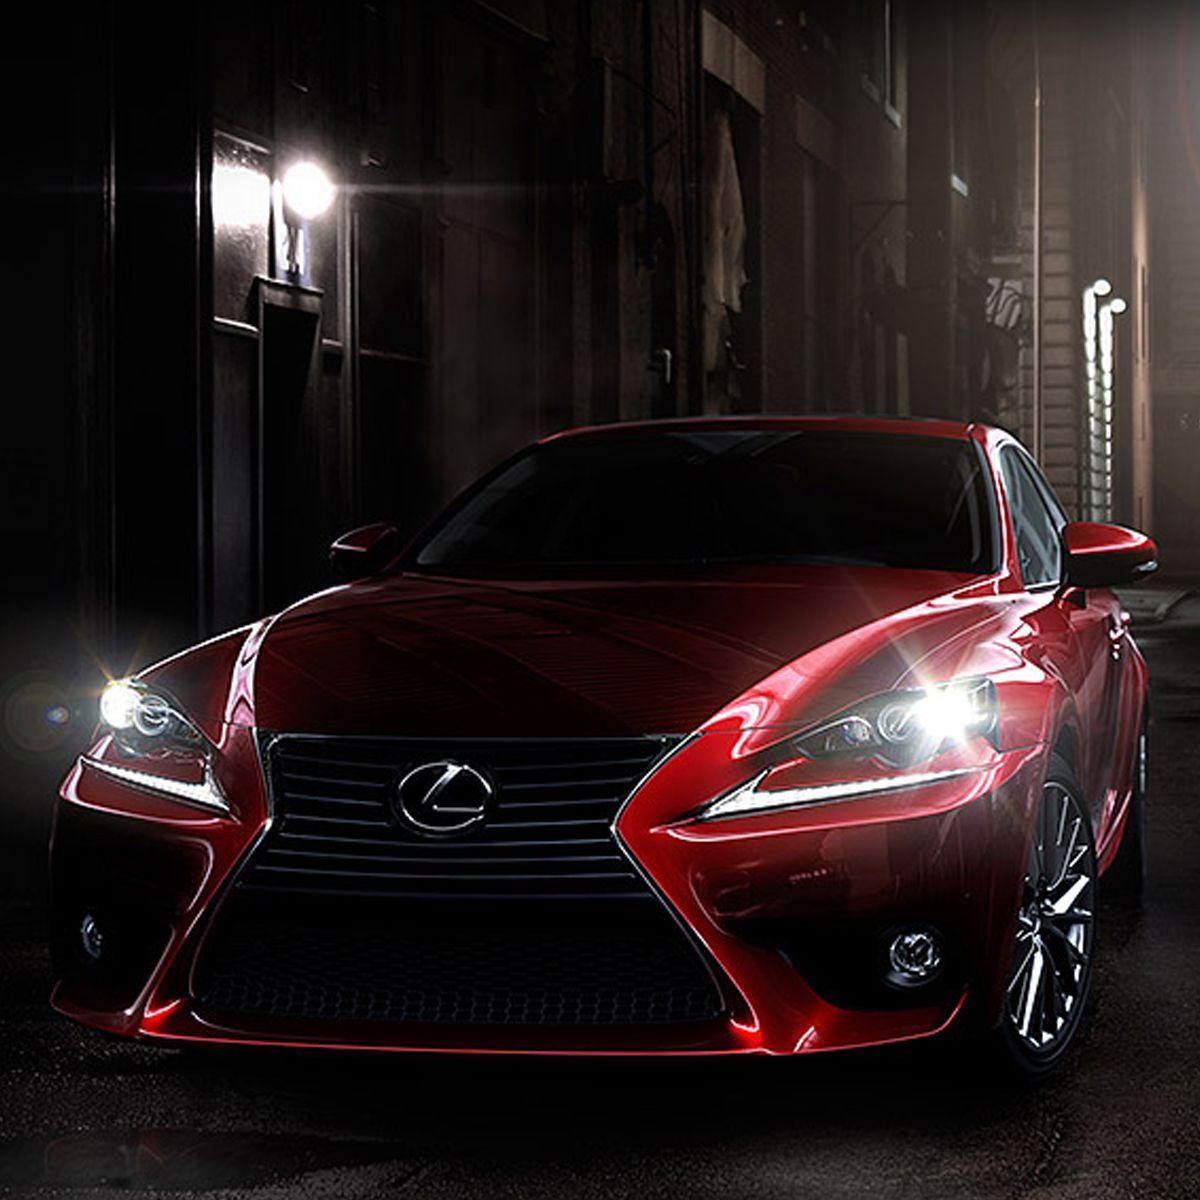 Lexus Is 250 Lease >> Lexus Is Lexus Cars Lexus Models Sports Sedan